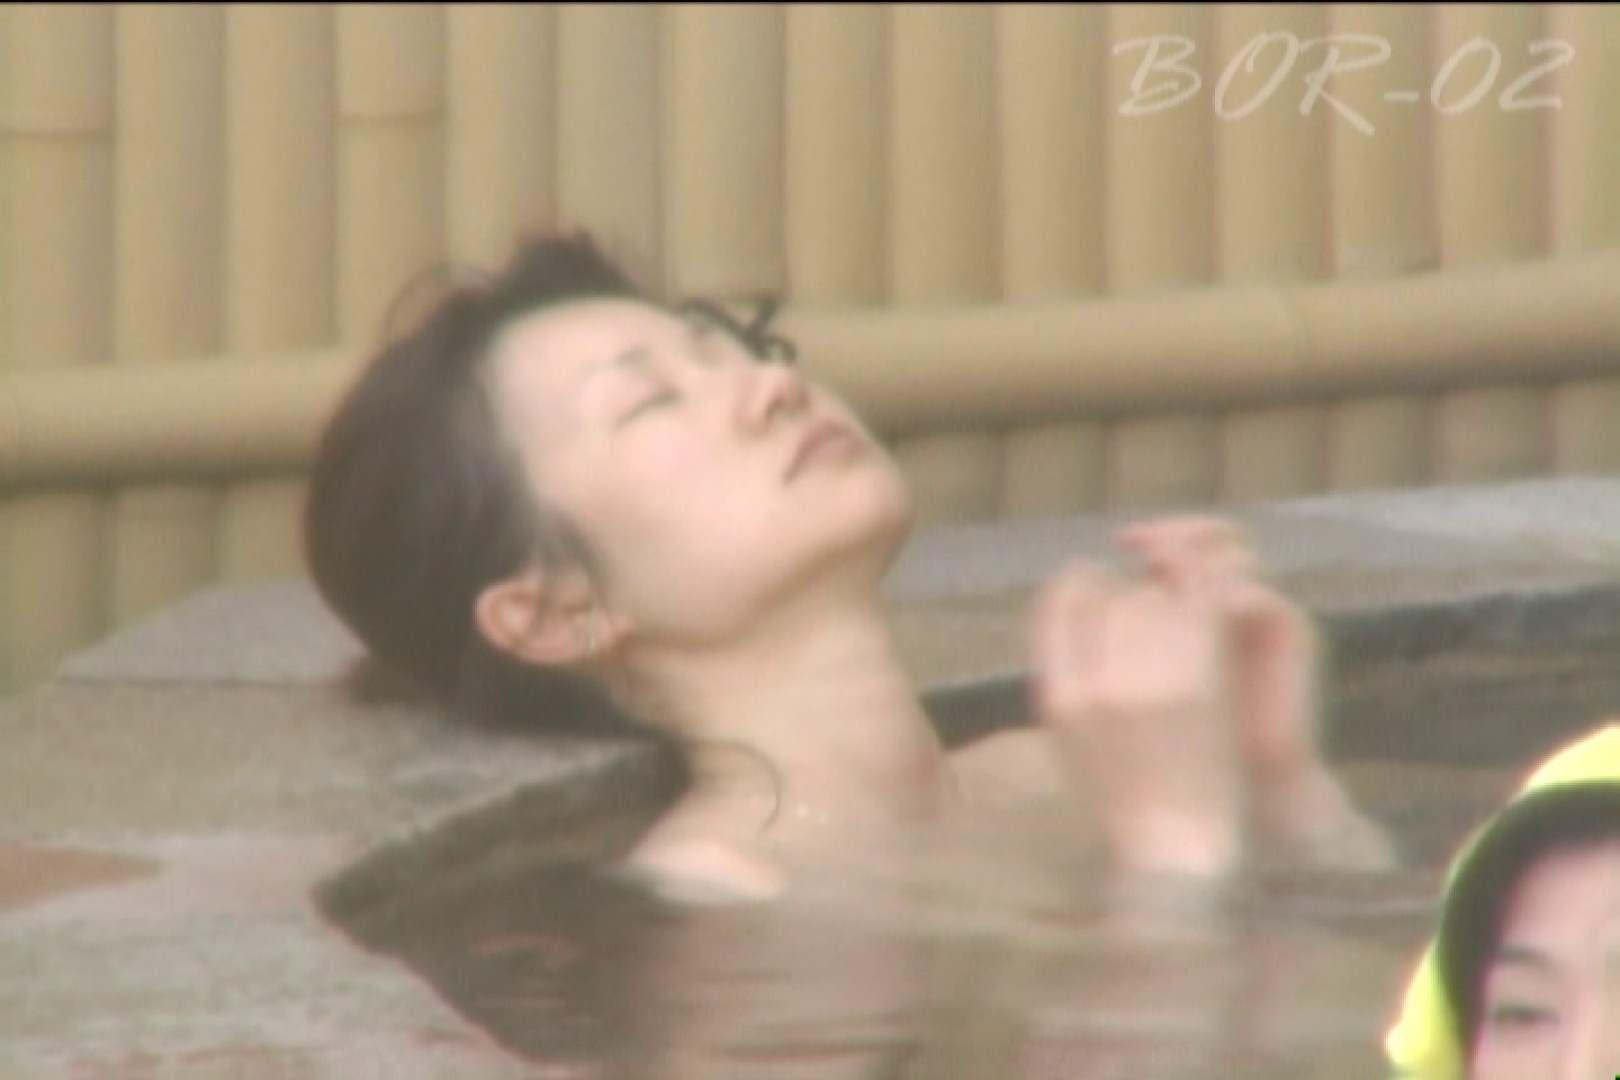 Aquaな露天風呂Vol.477 露天 アダルト動画キャプチャ 99PICs 29